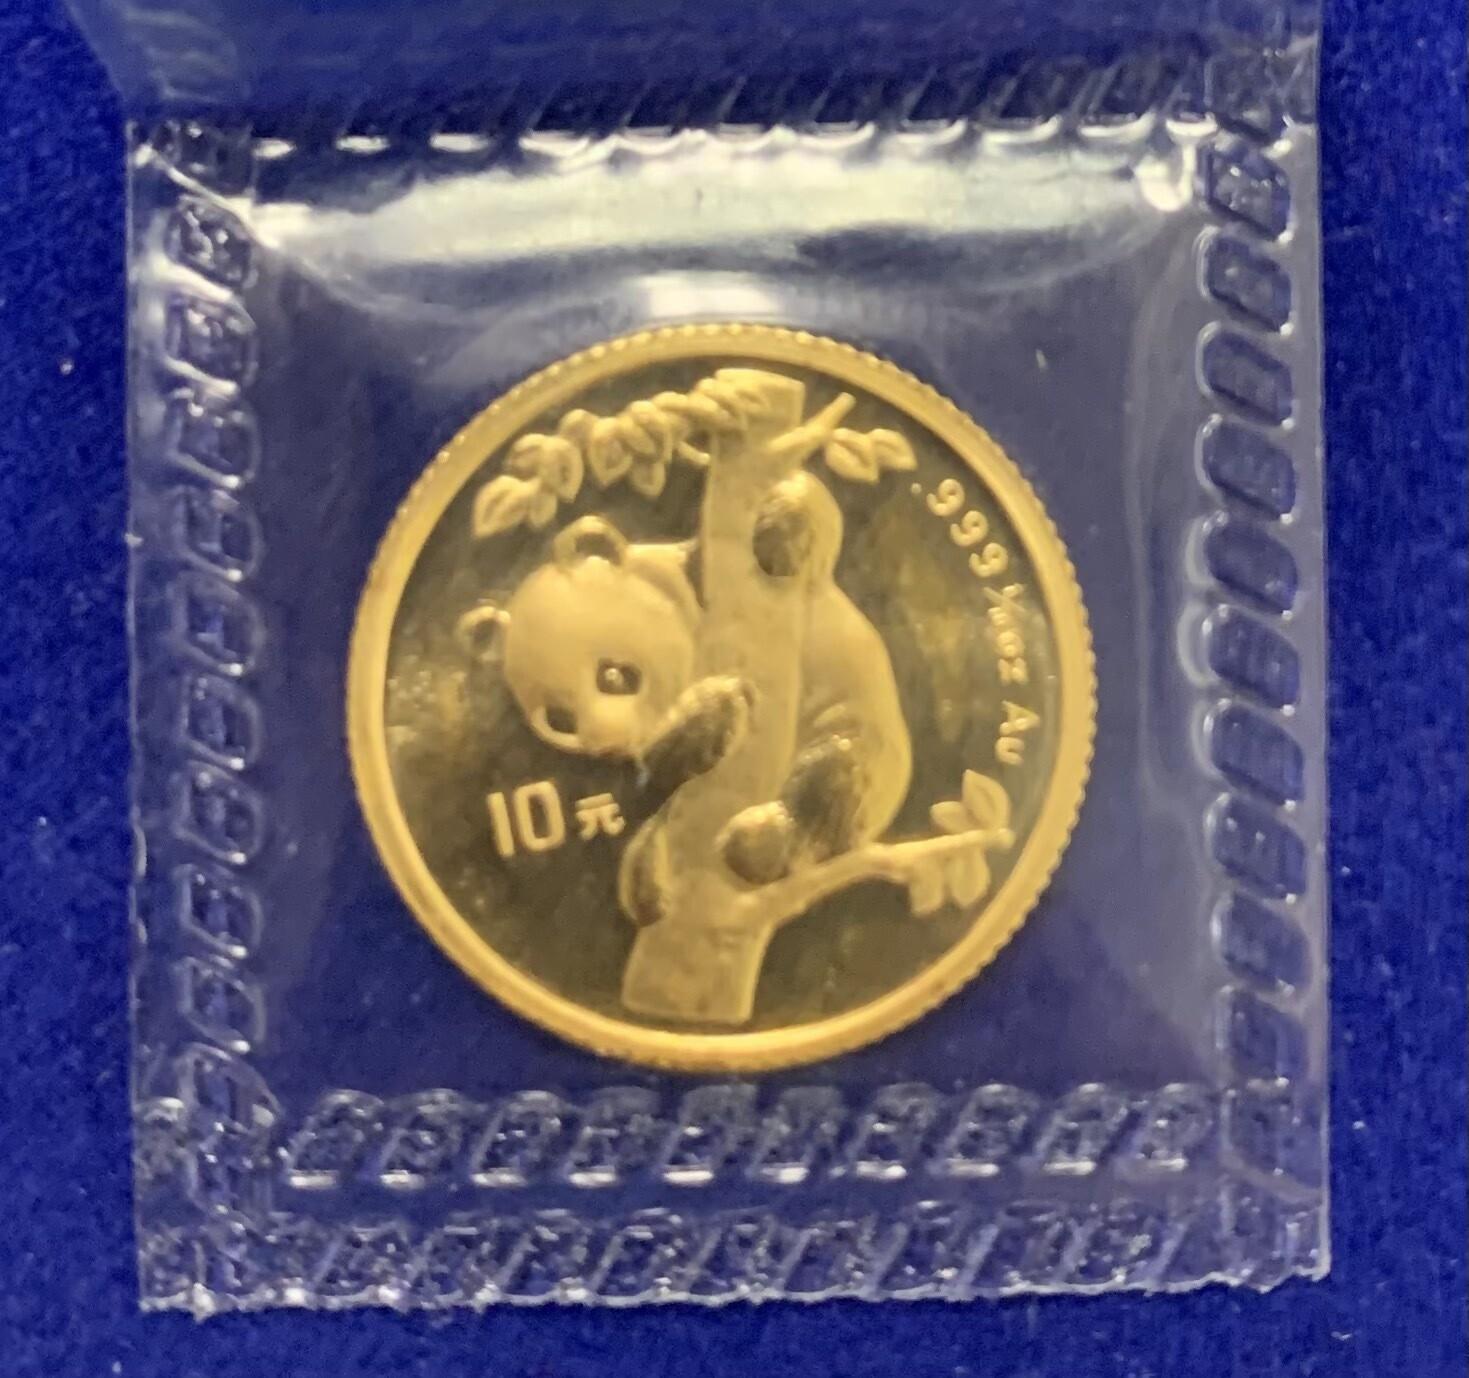 1996 China Panda 10 Yuan 1/10 Oz Gold Coin